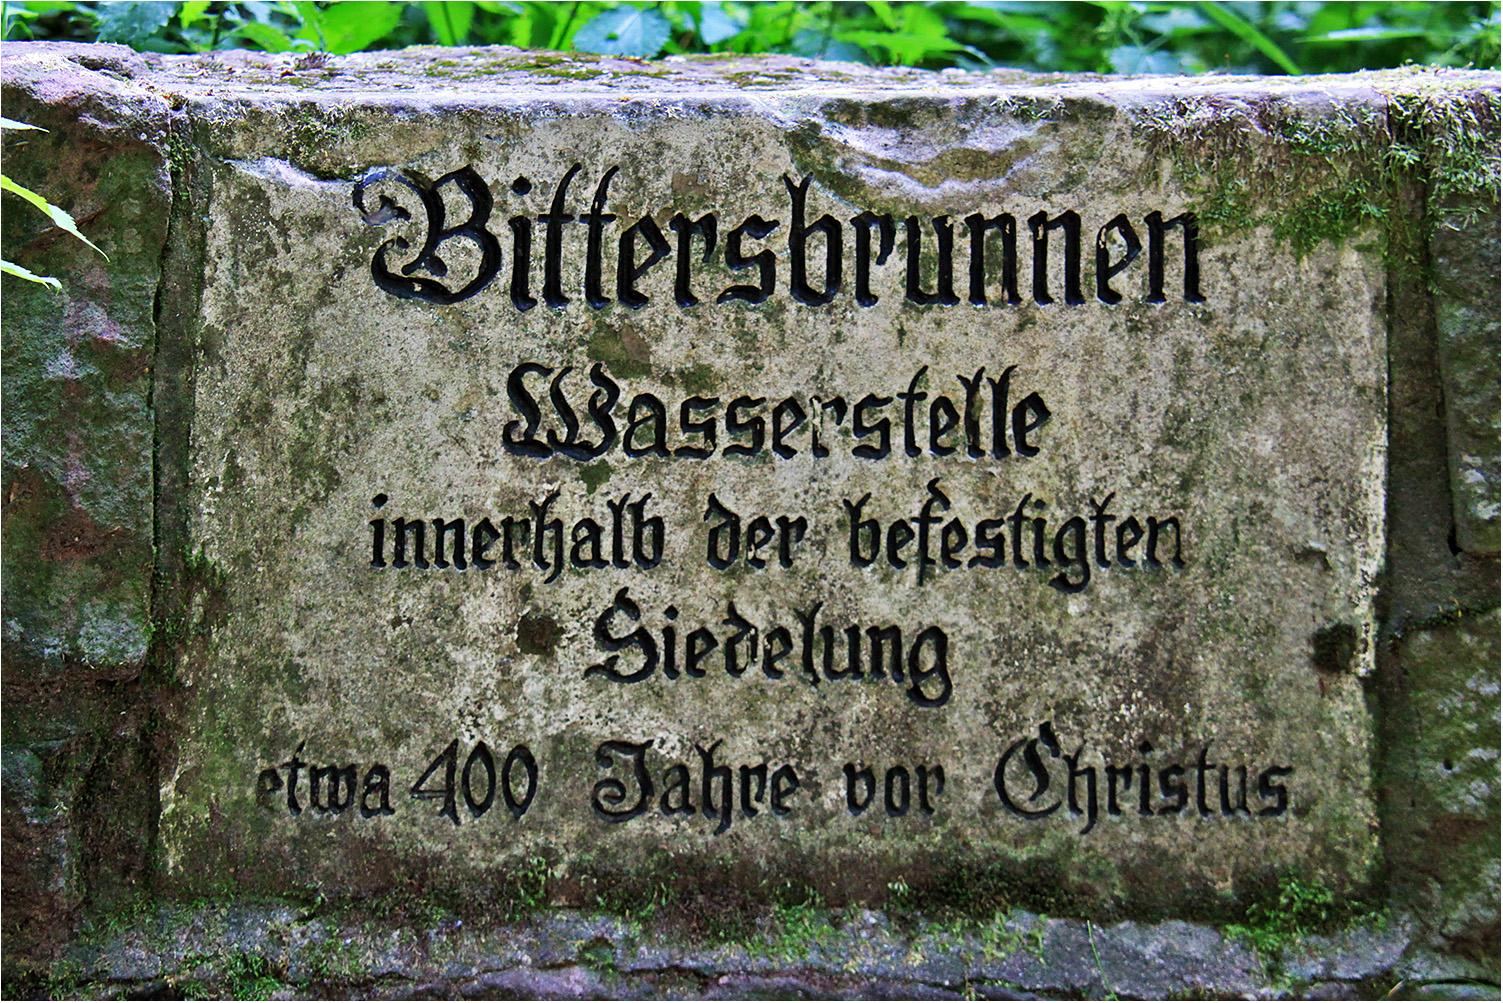 Bittersbrunnen, Wie Dazumal